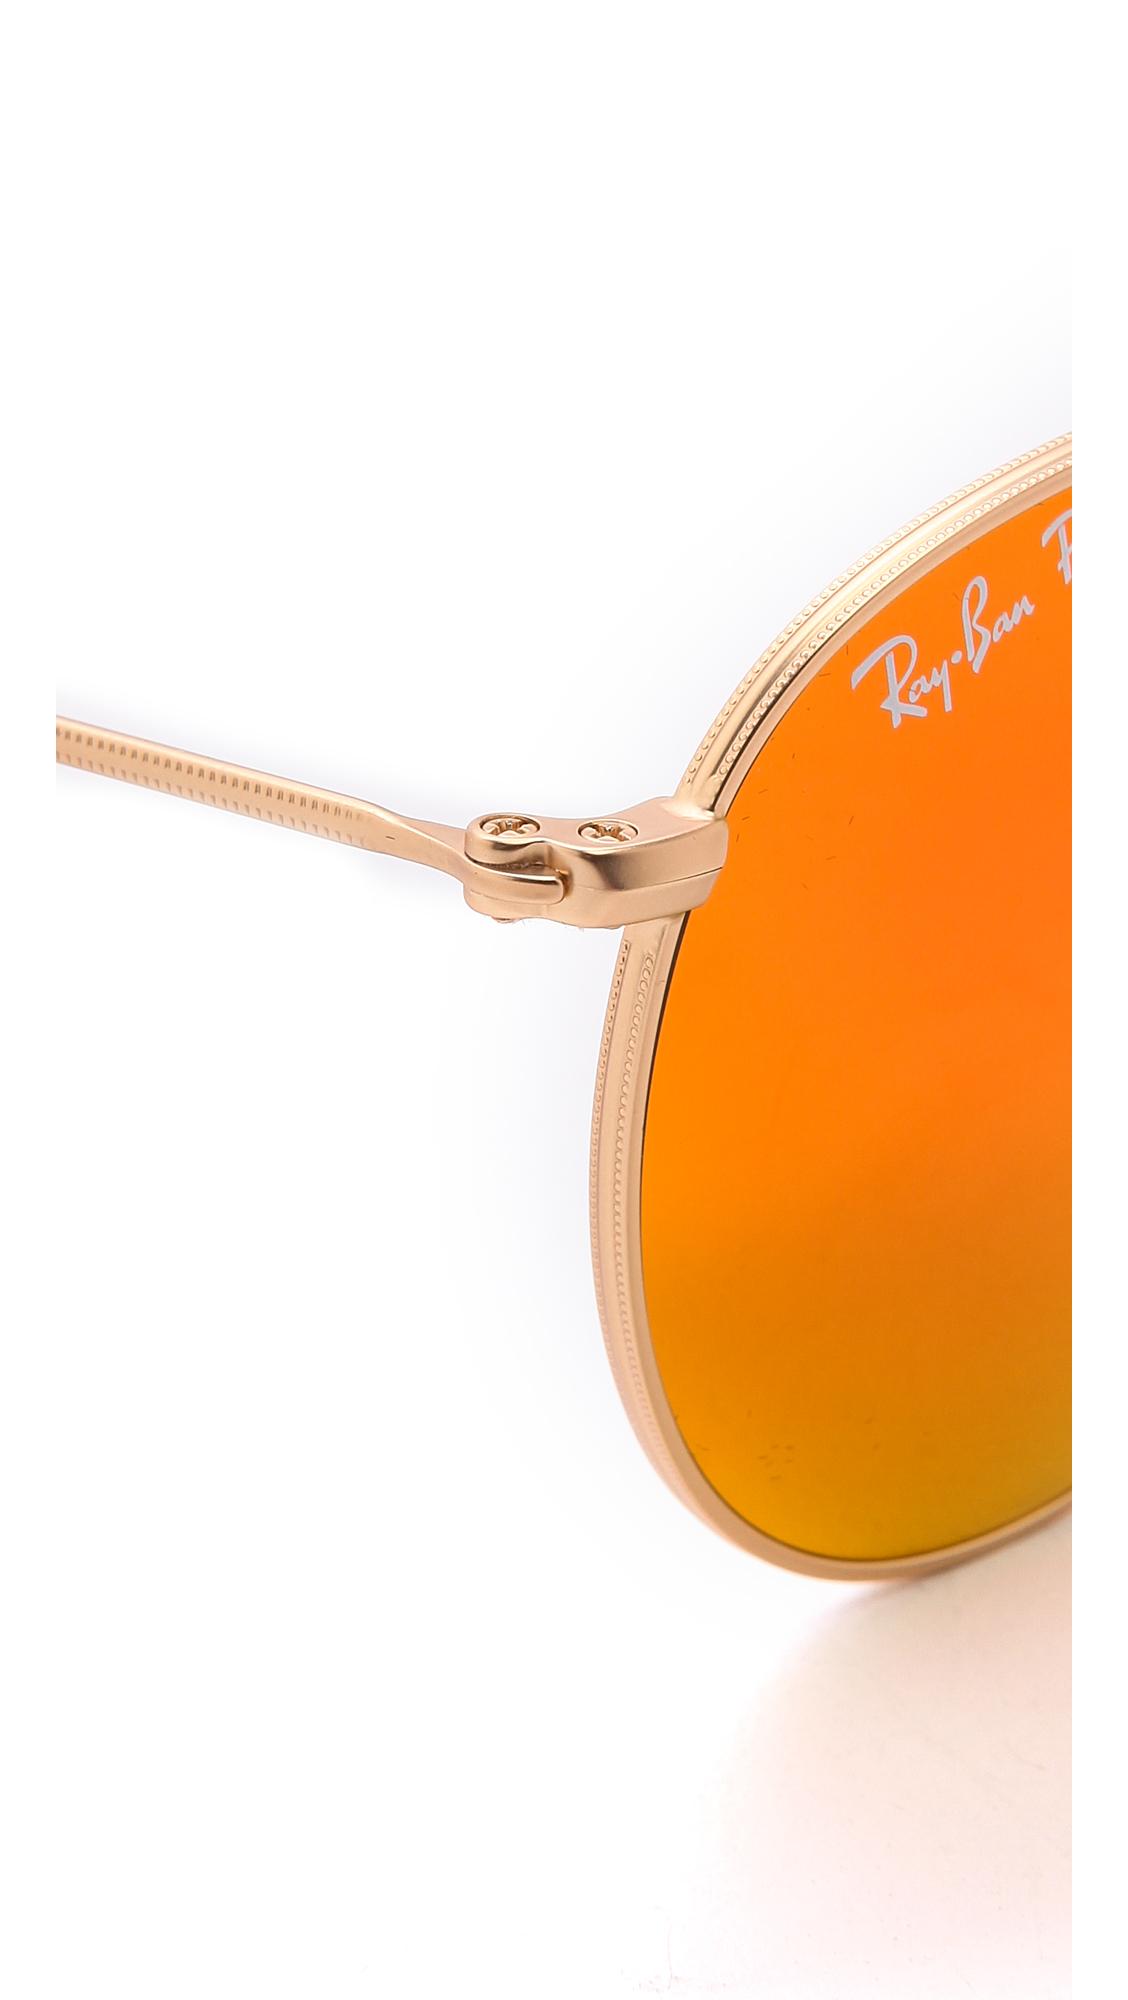 Ban mirrrored polarized icons sunglasses